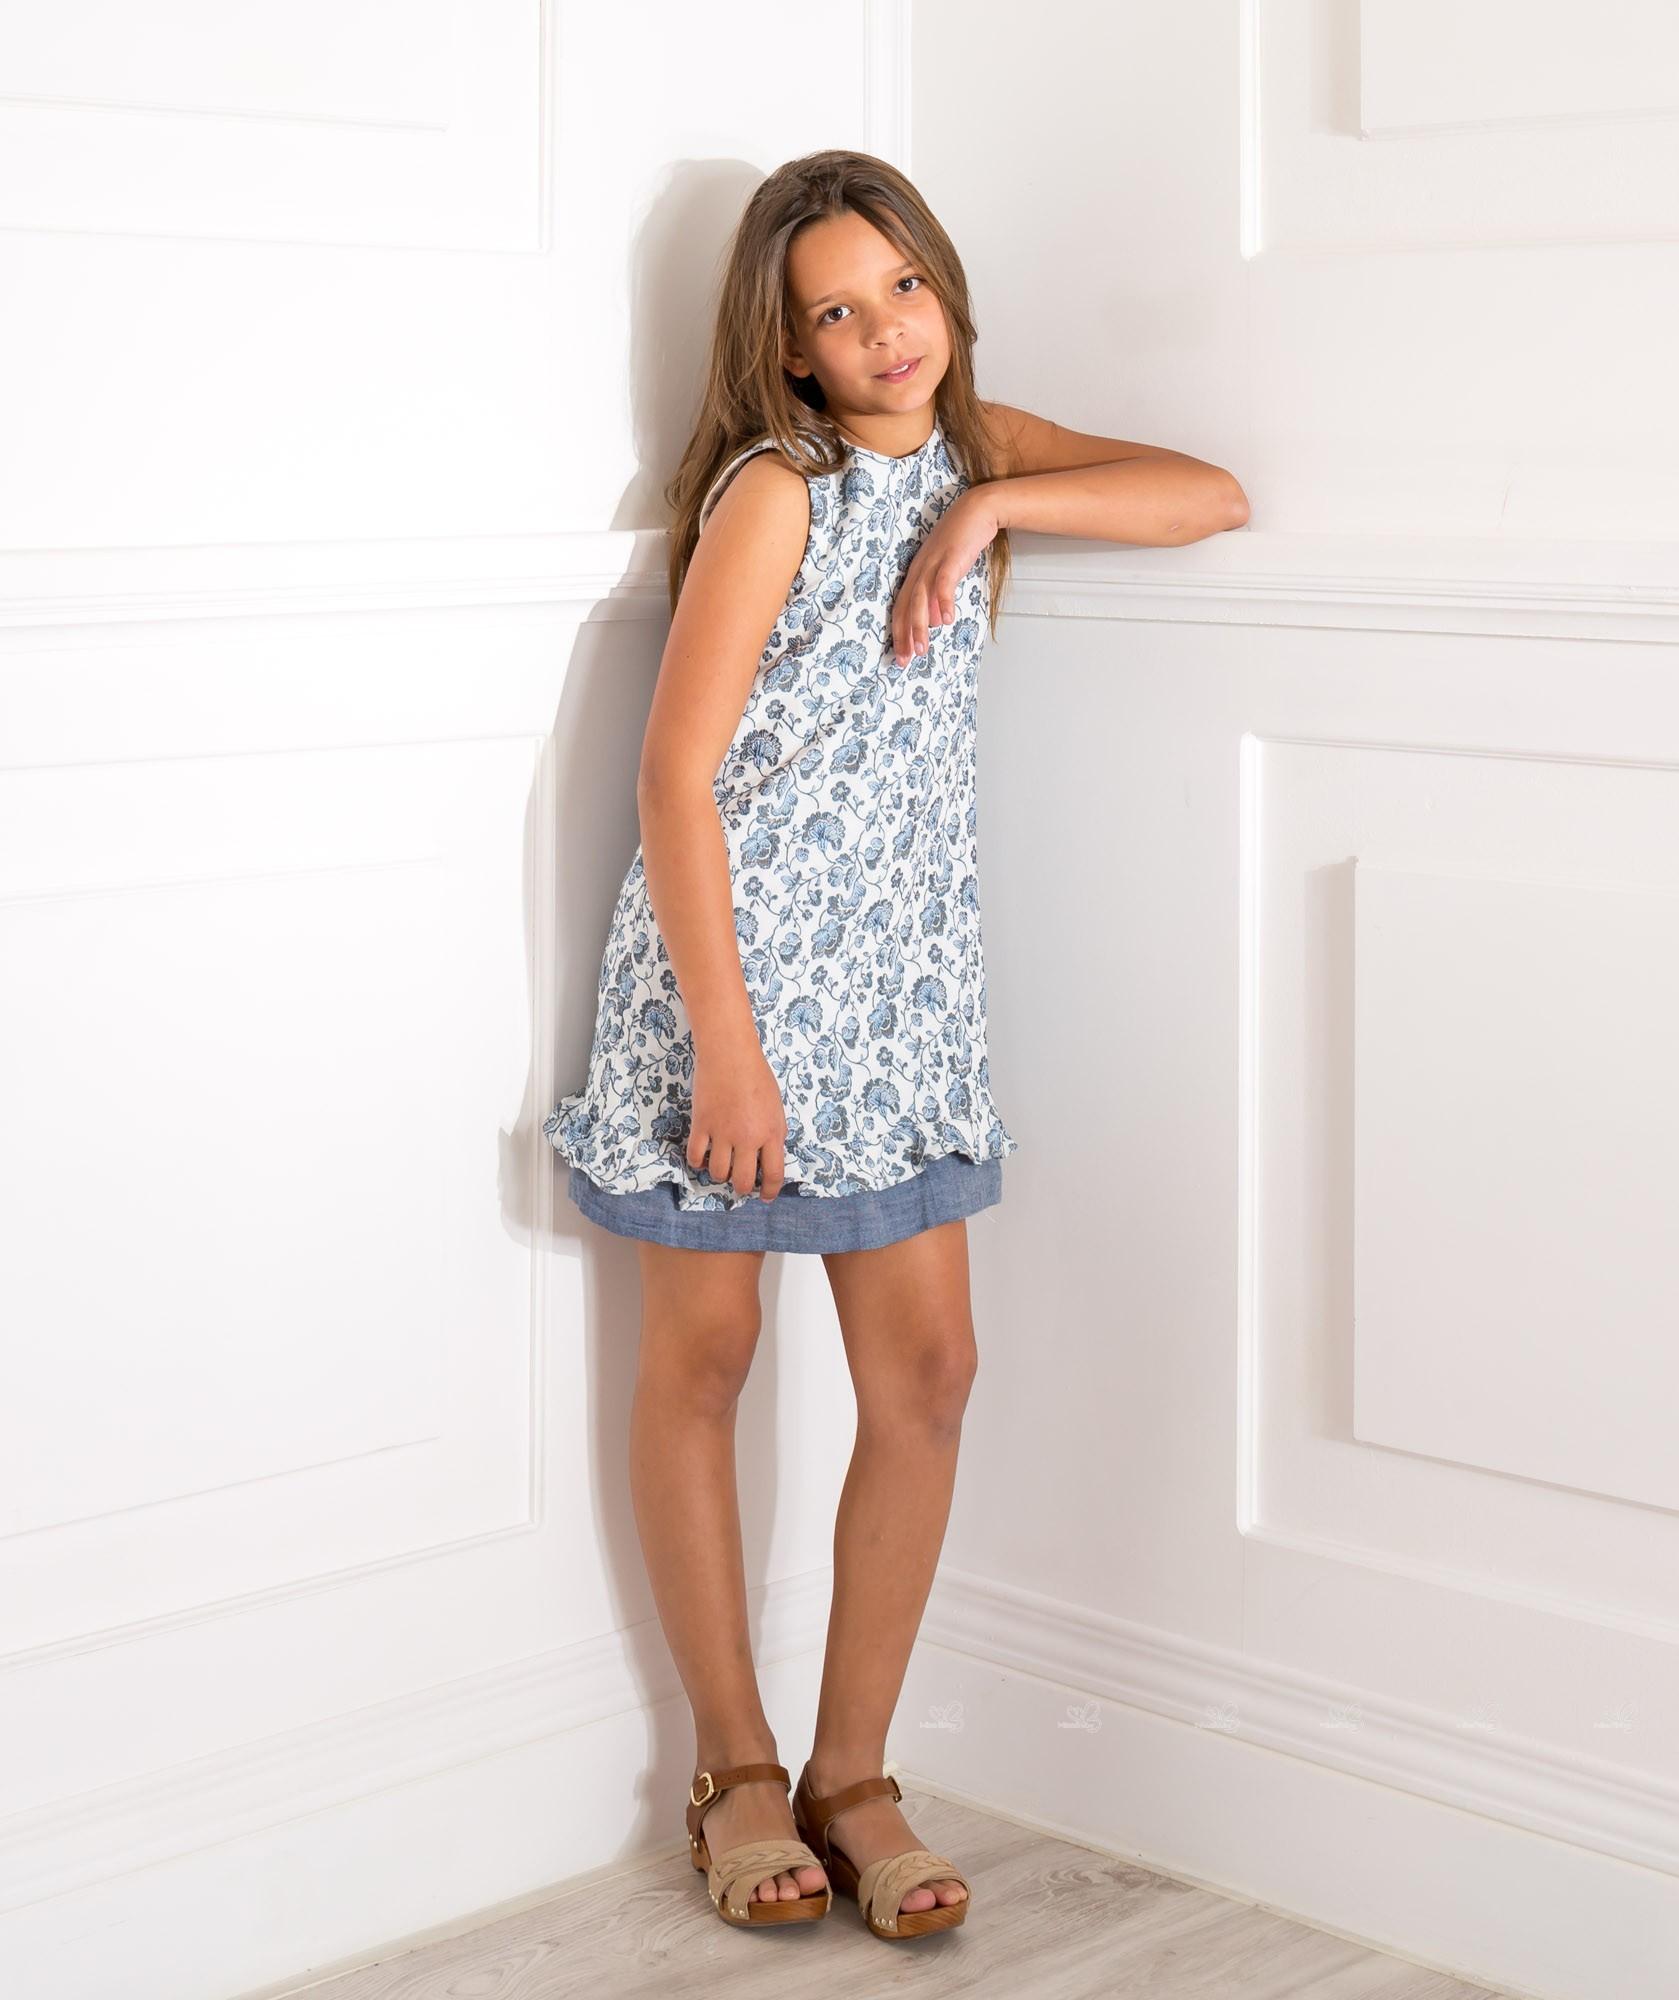 Rochy White & Navy Blue Polka Dot Dress With Ruffle Back   Missbaby